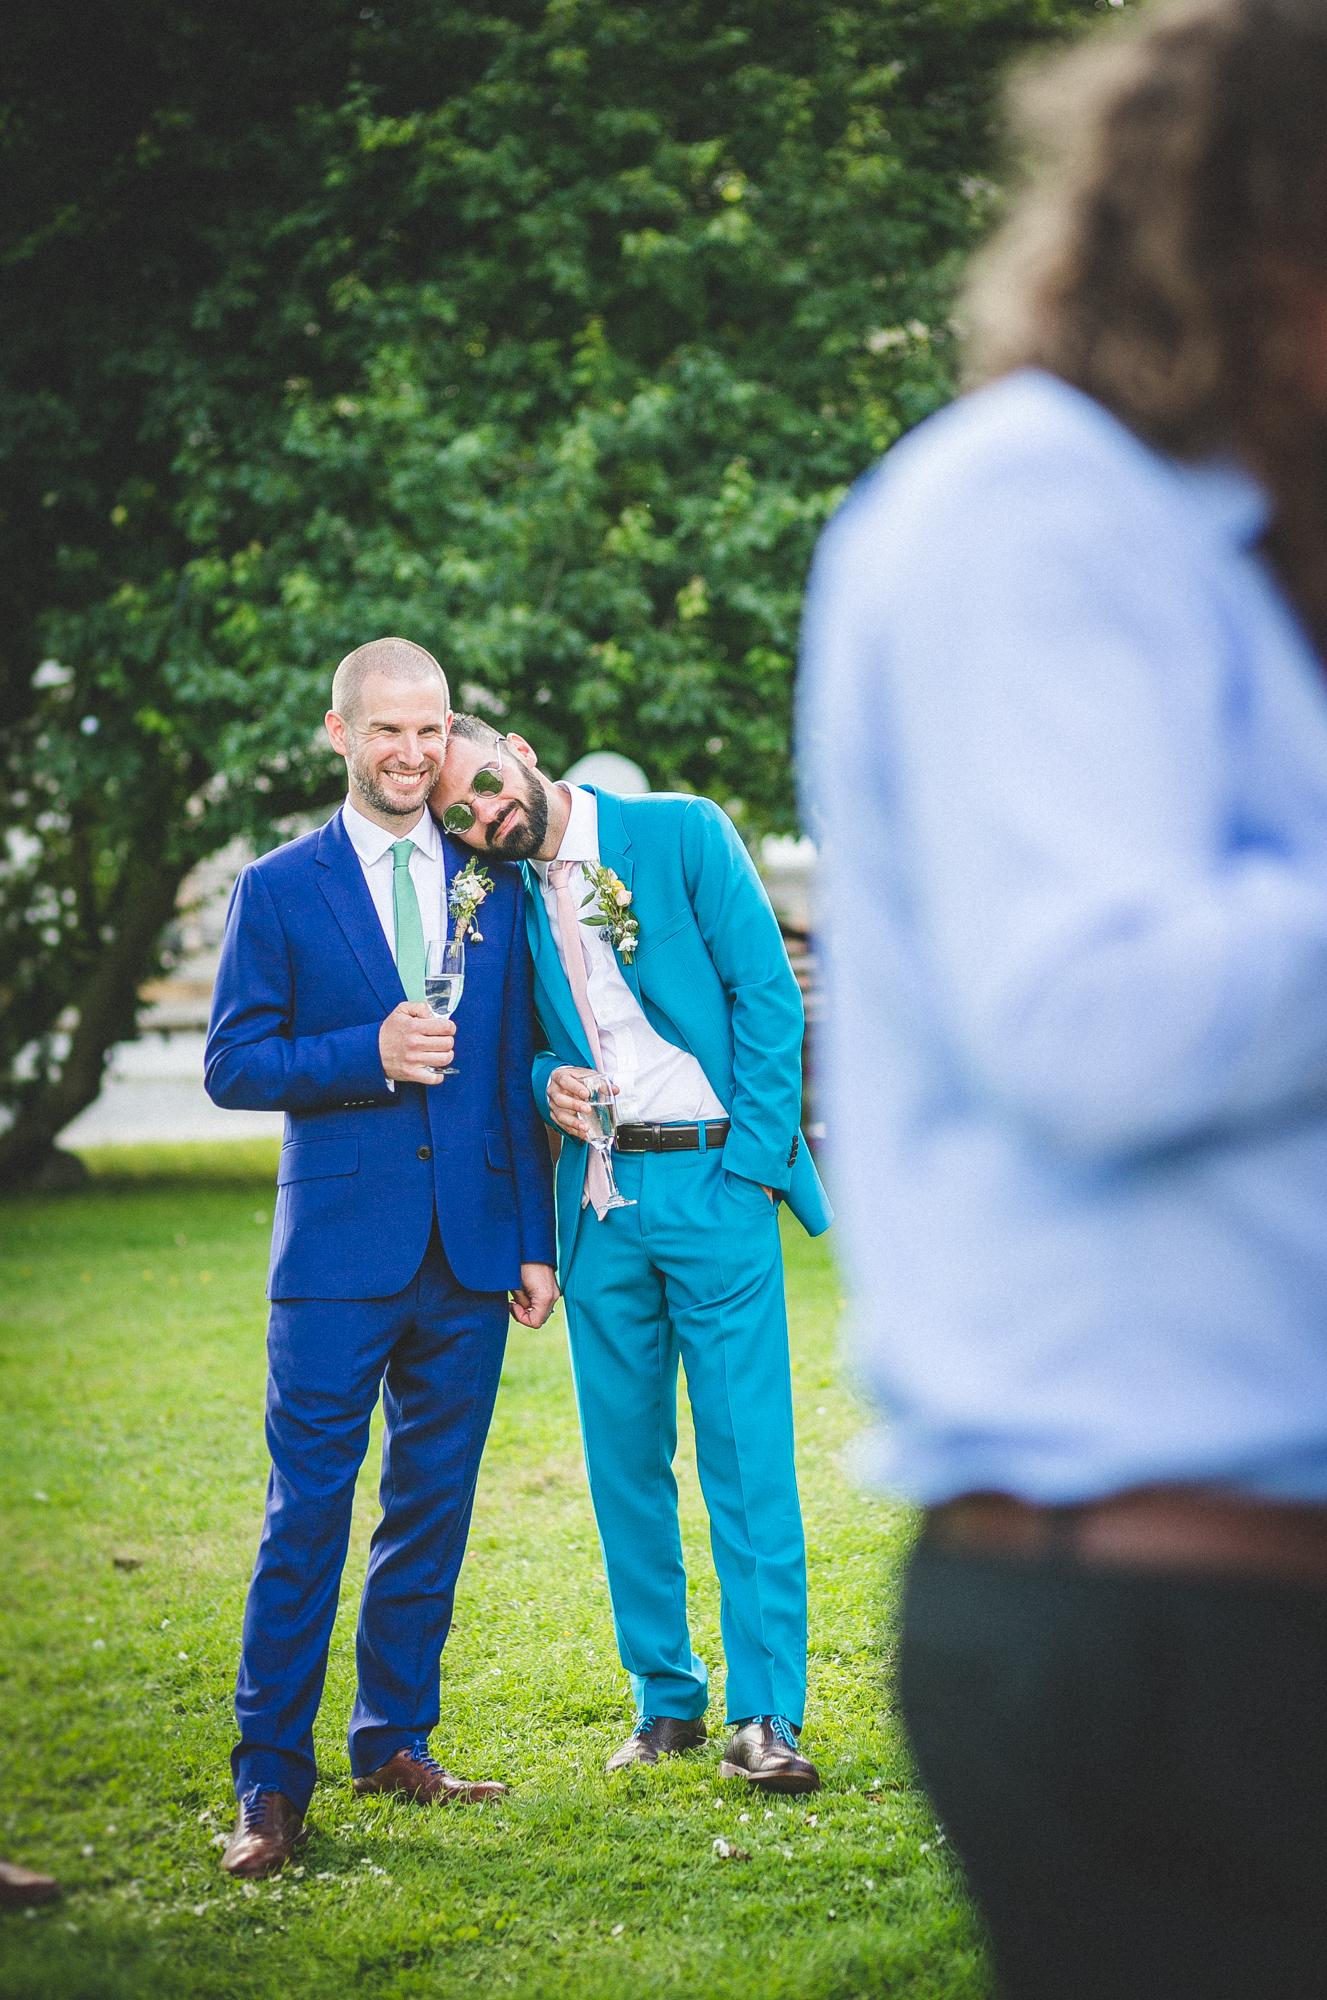 Gay weddings Ireland Millhouse-183.jpg